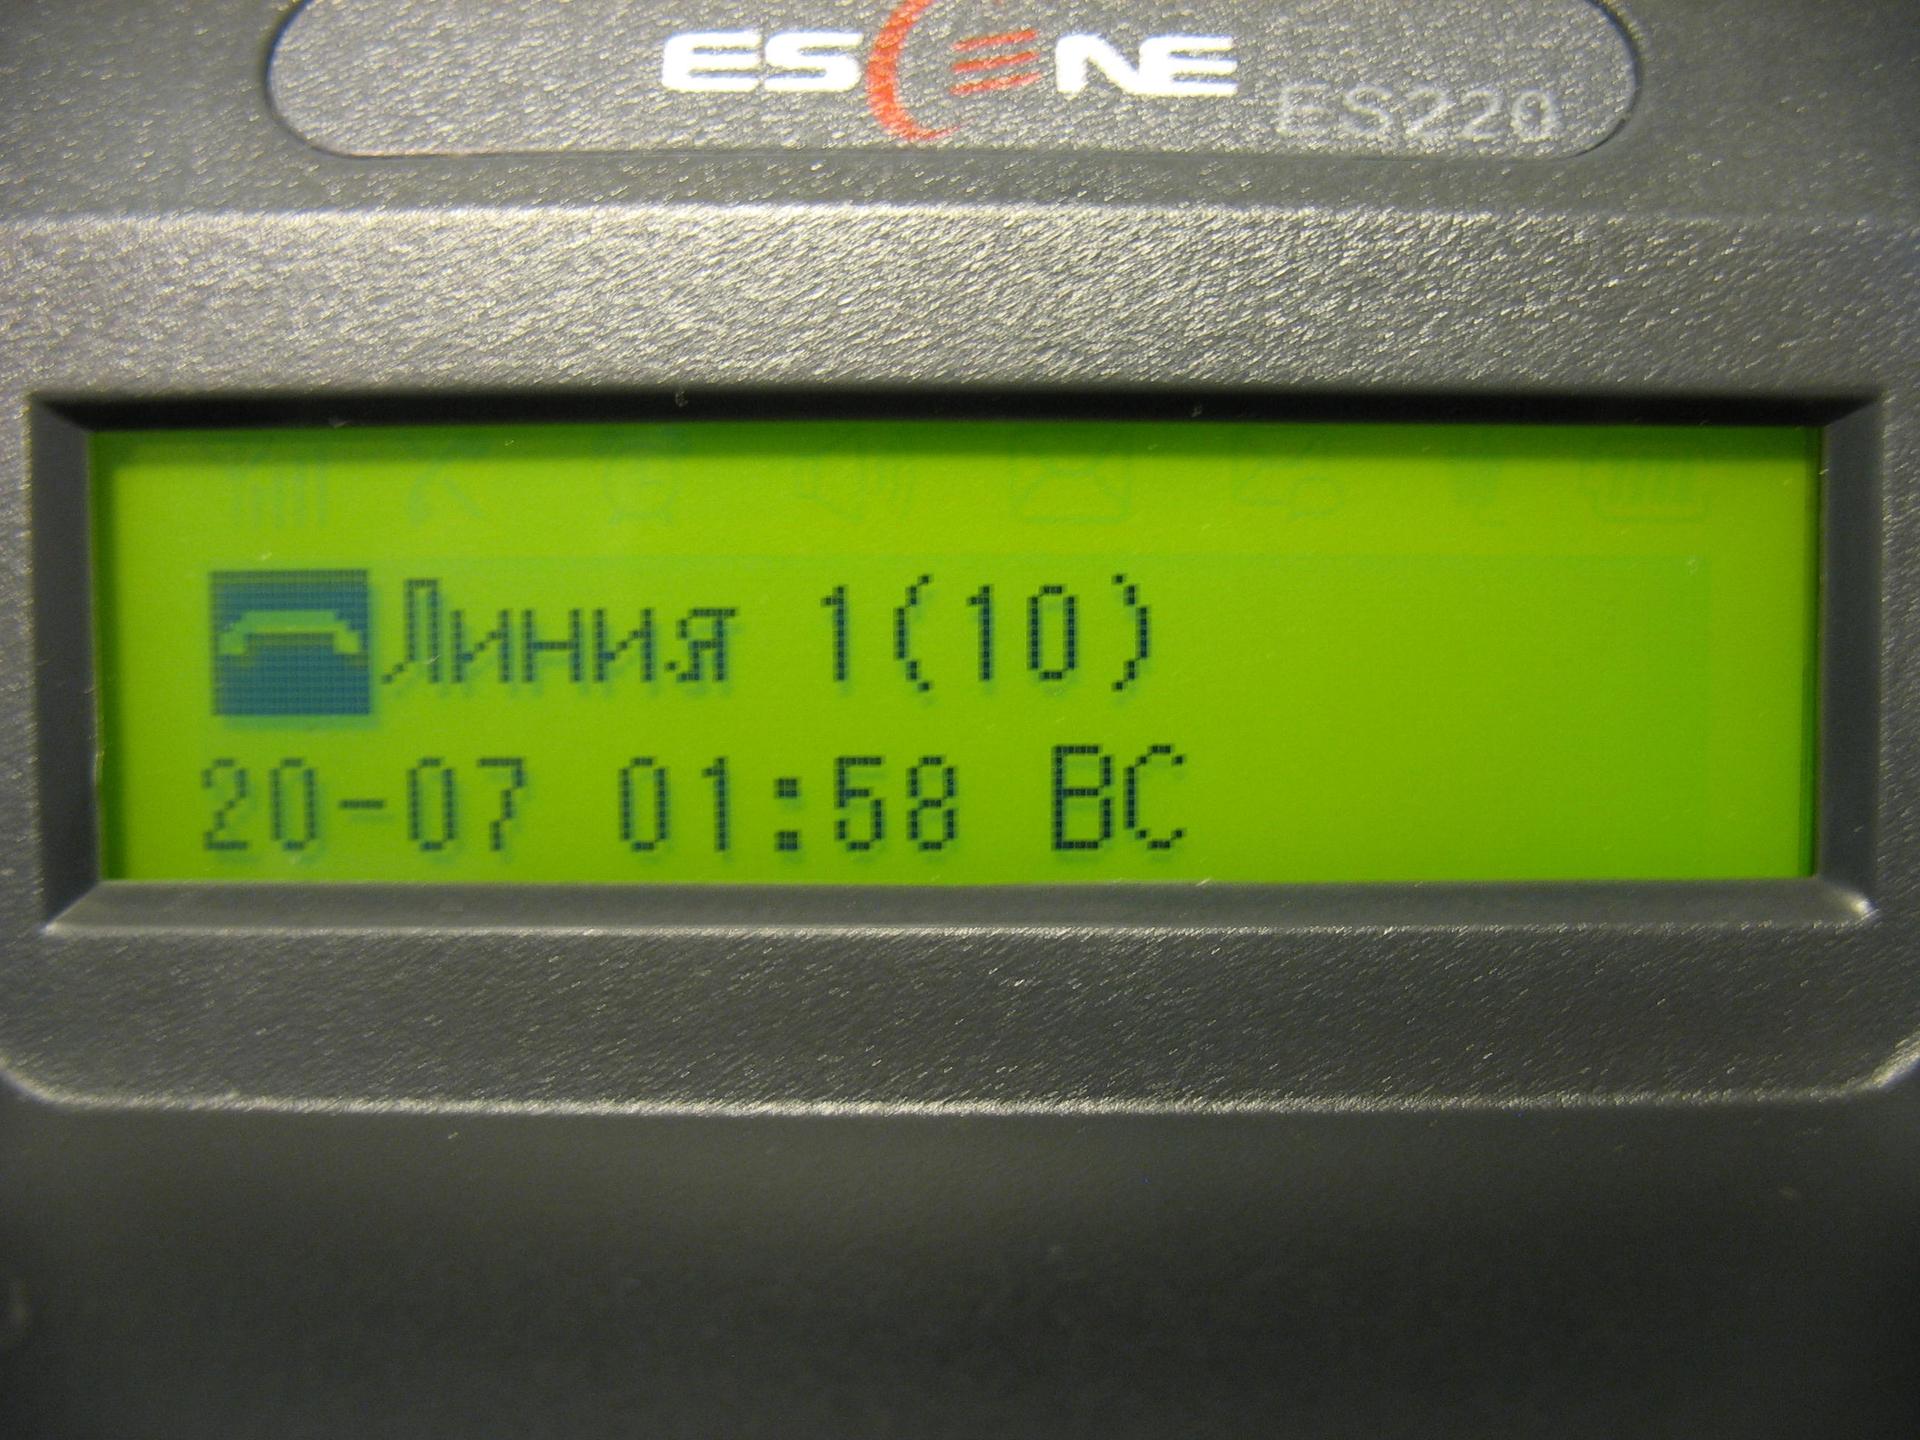 Индикация на экране — Линия 1 зарегистрирована